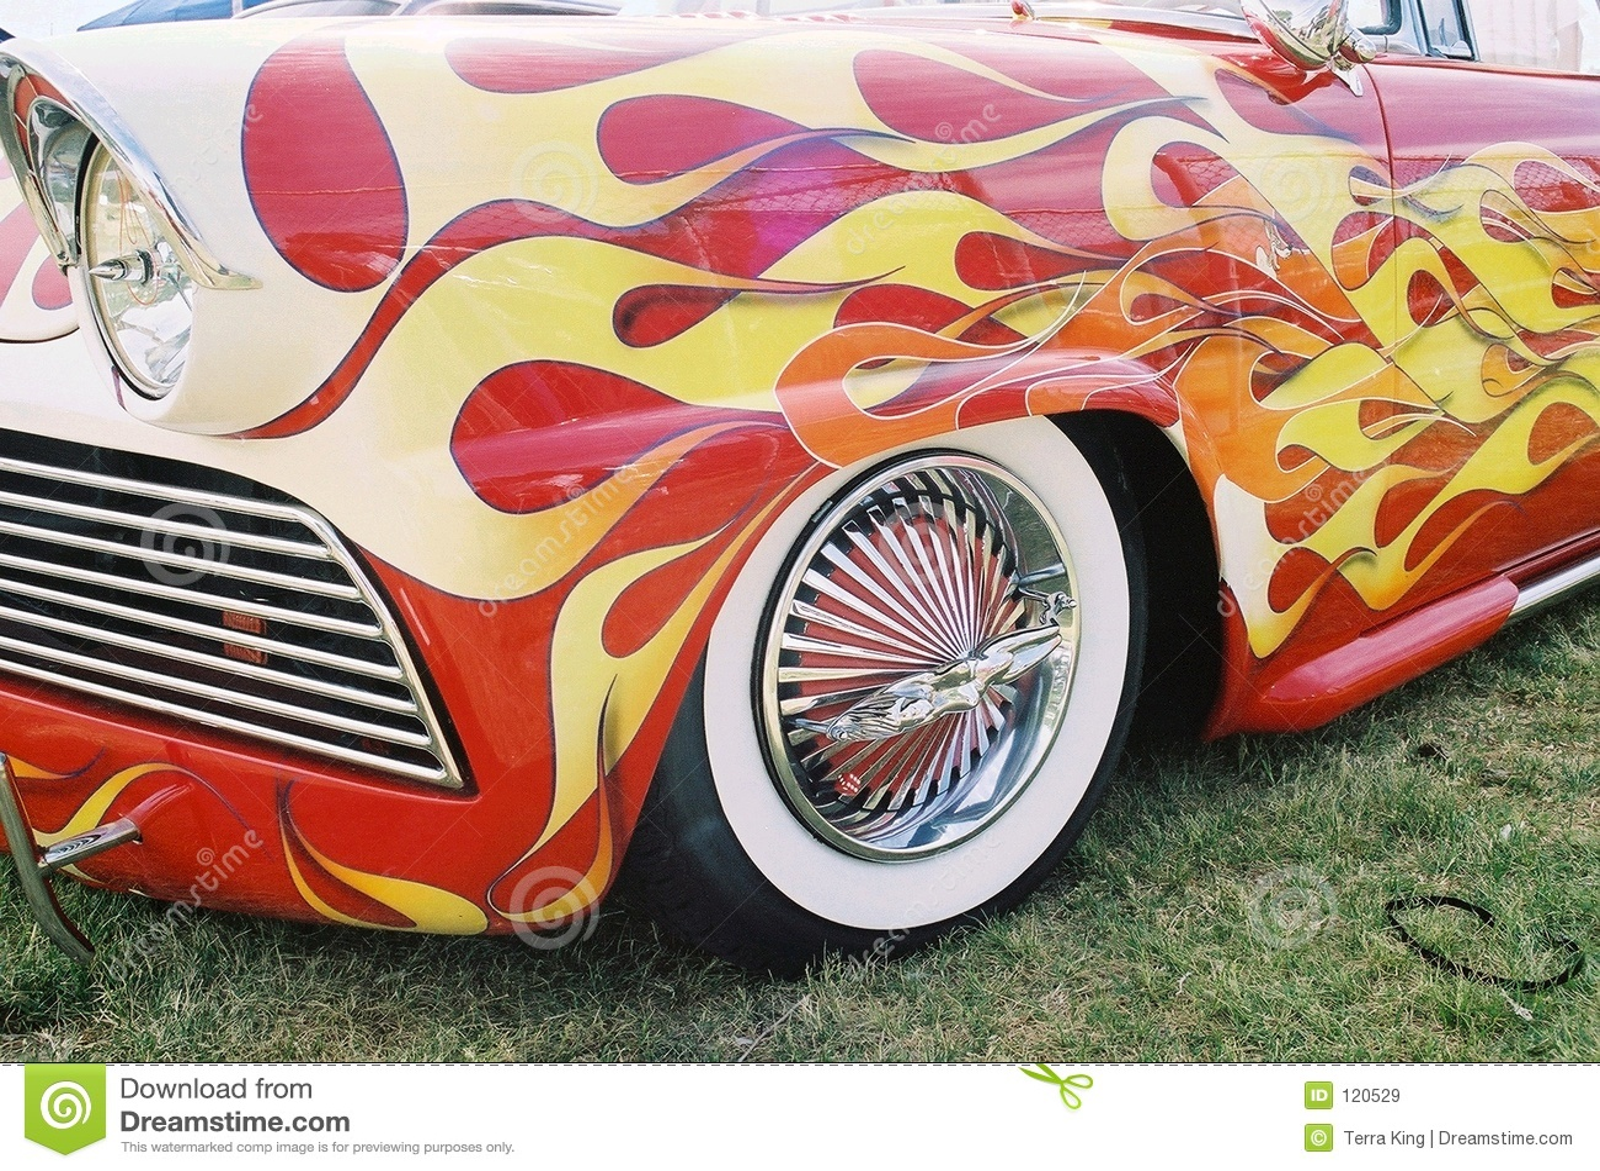 Flaming vintage car w/ naked lady rims